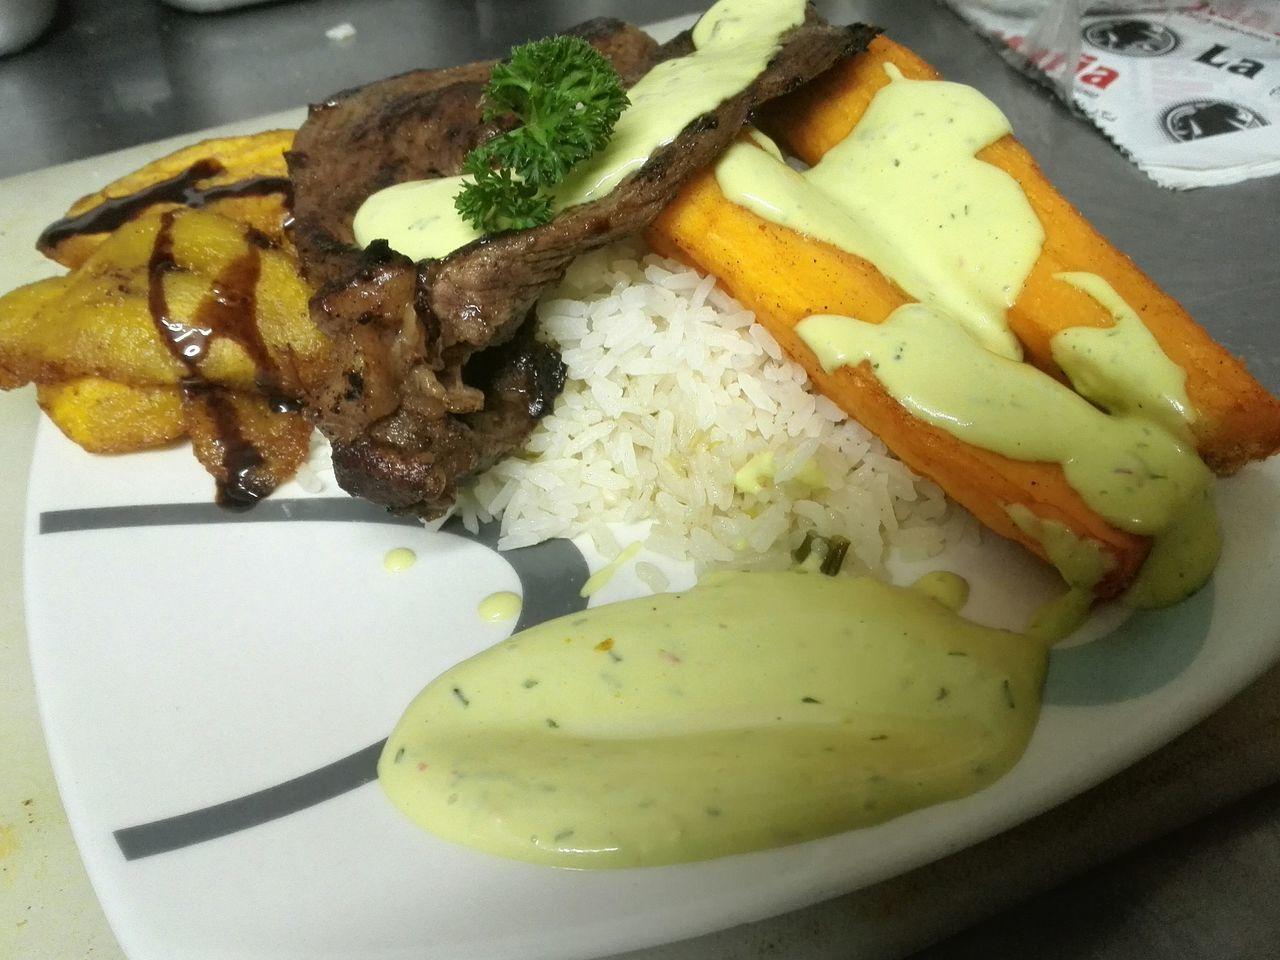 Almuerzo Food Ready-to-eat Meal Almuerzo Comidas Comida Colombiana First Eyeem Photo